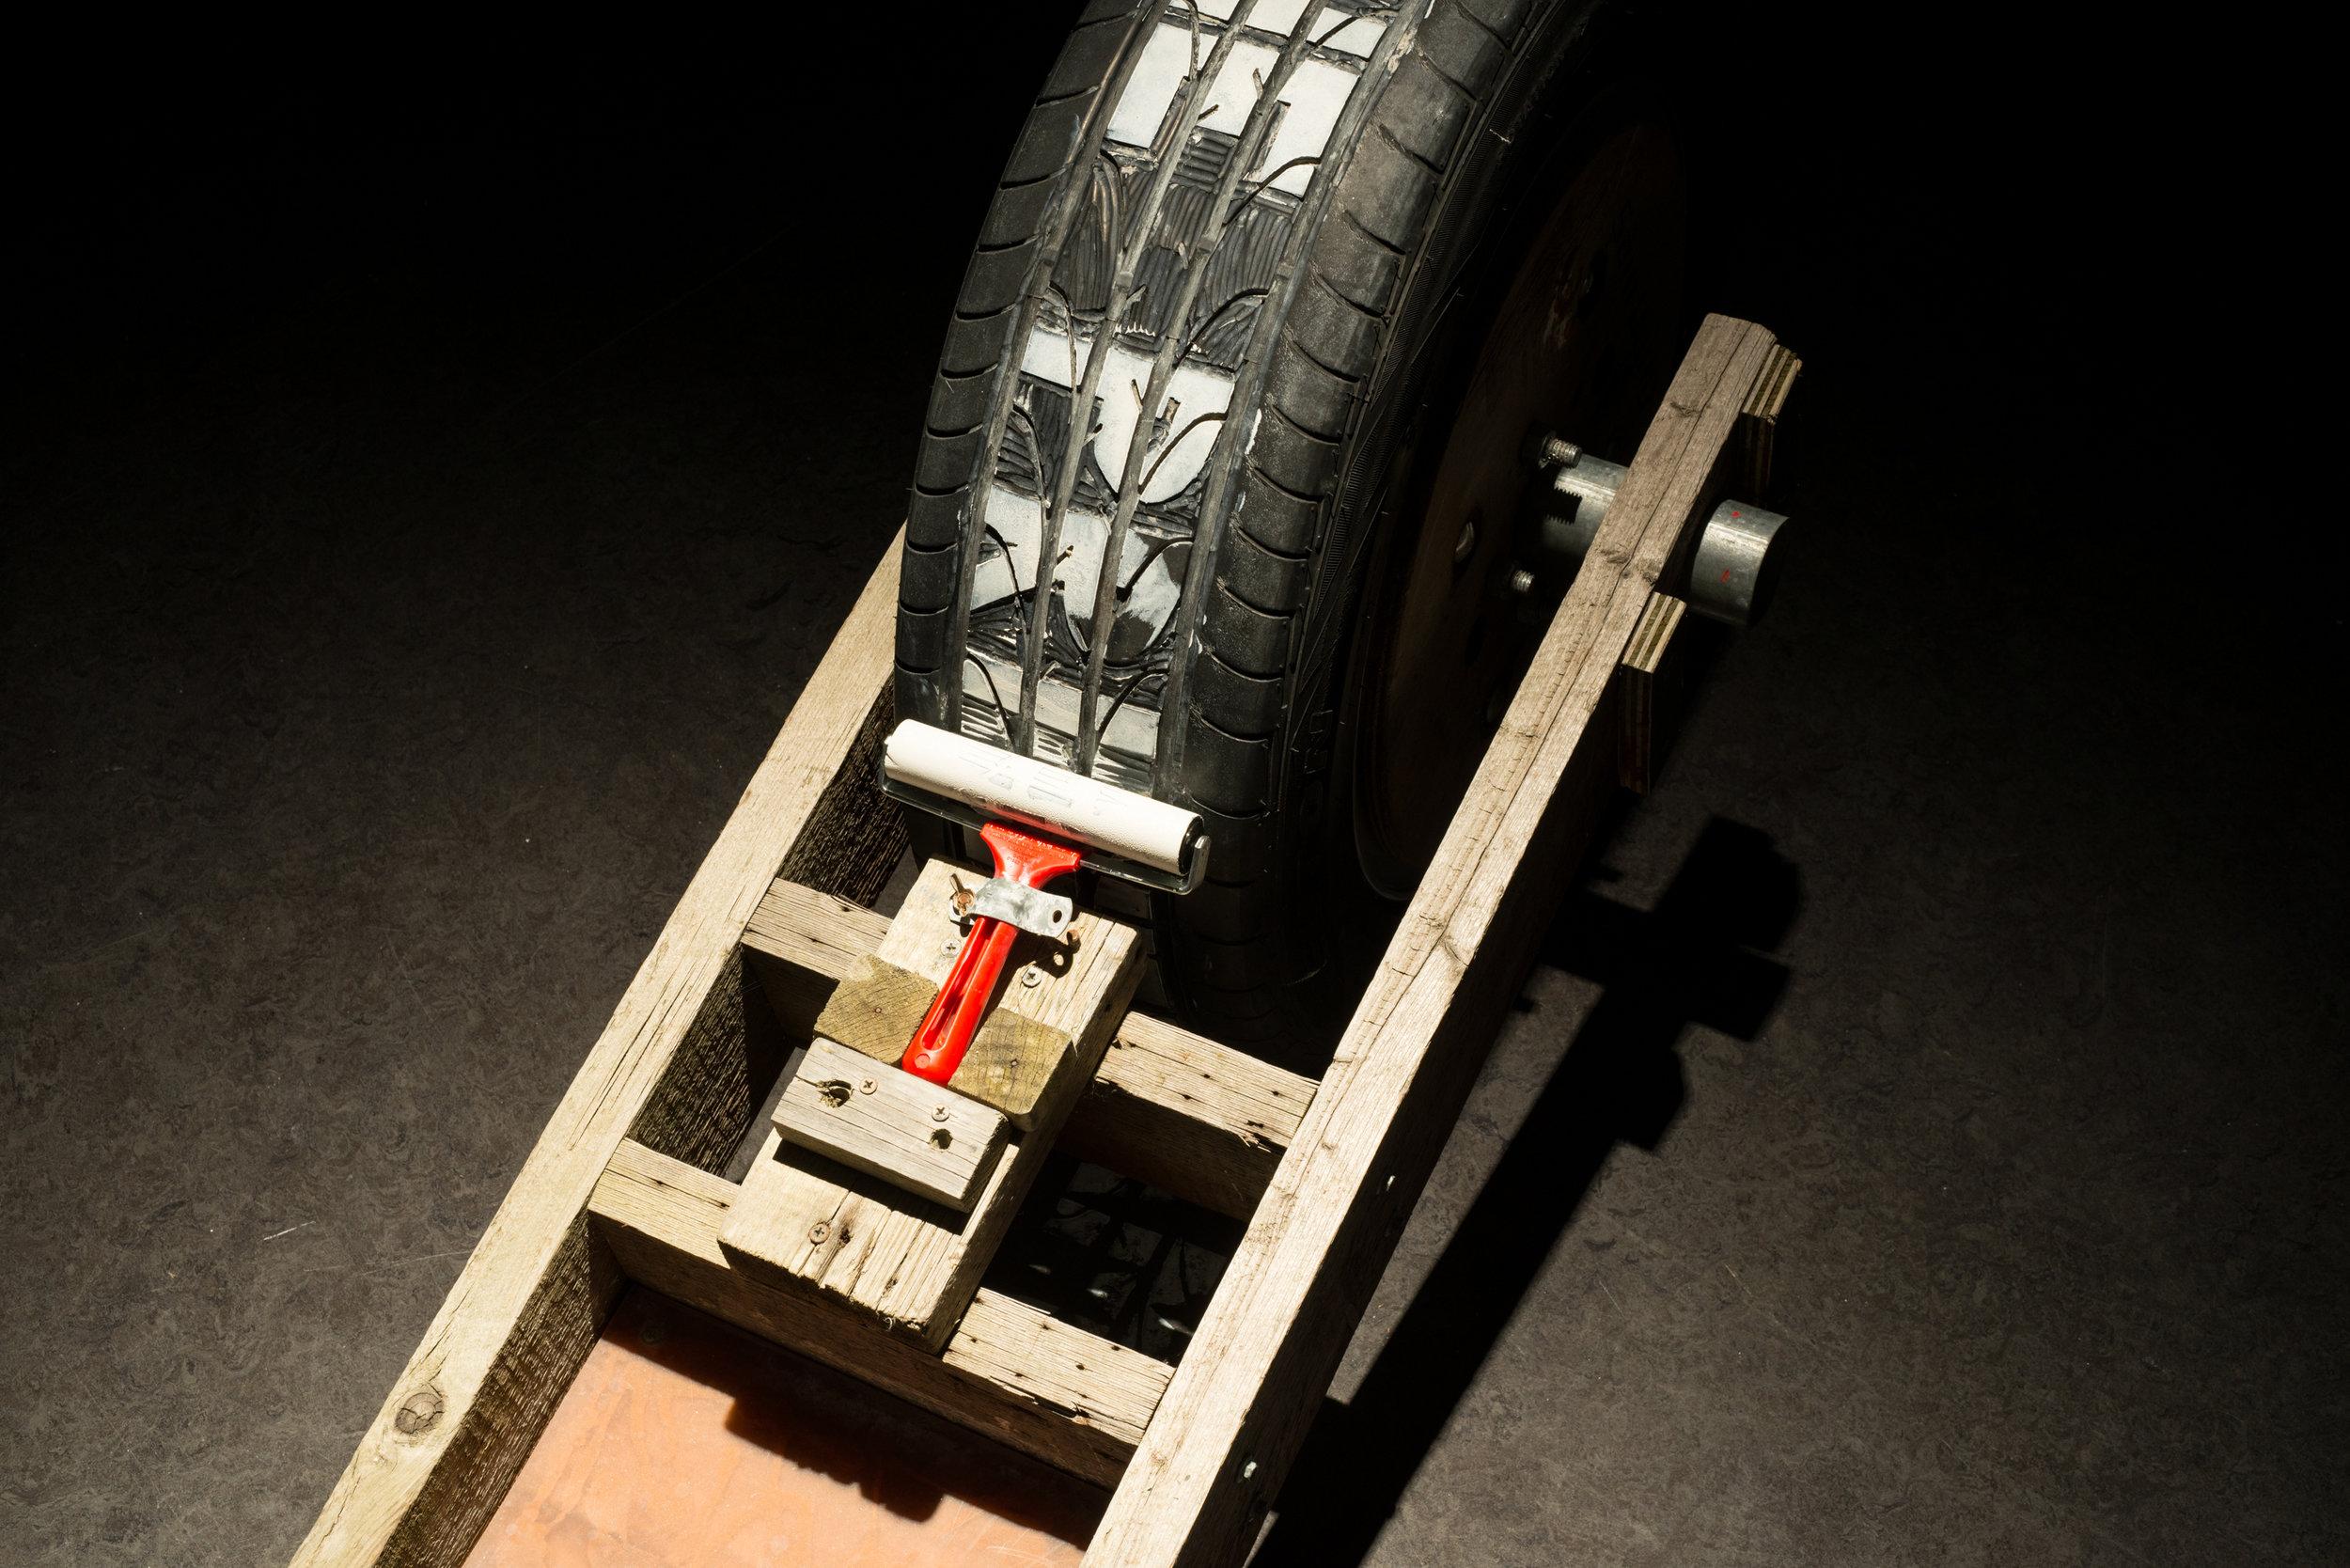 Performprint  Printing apparatus, 2014  car tyre, wood, print roller and ink  dimensions variable (detail)